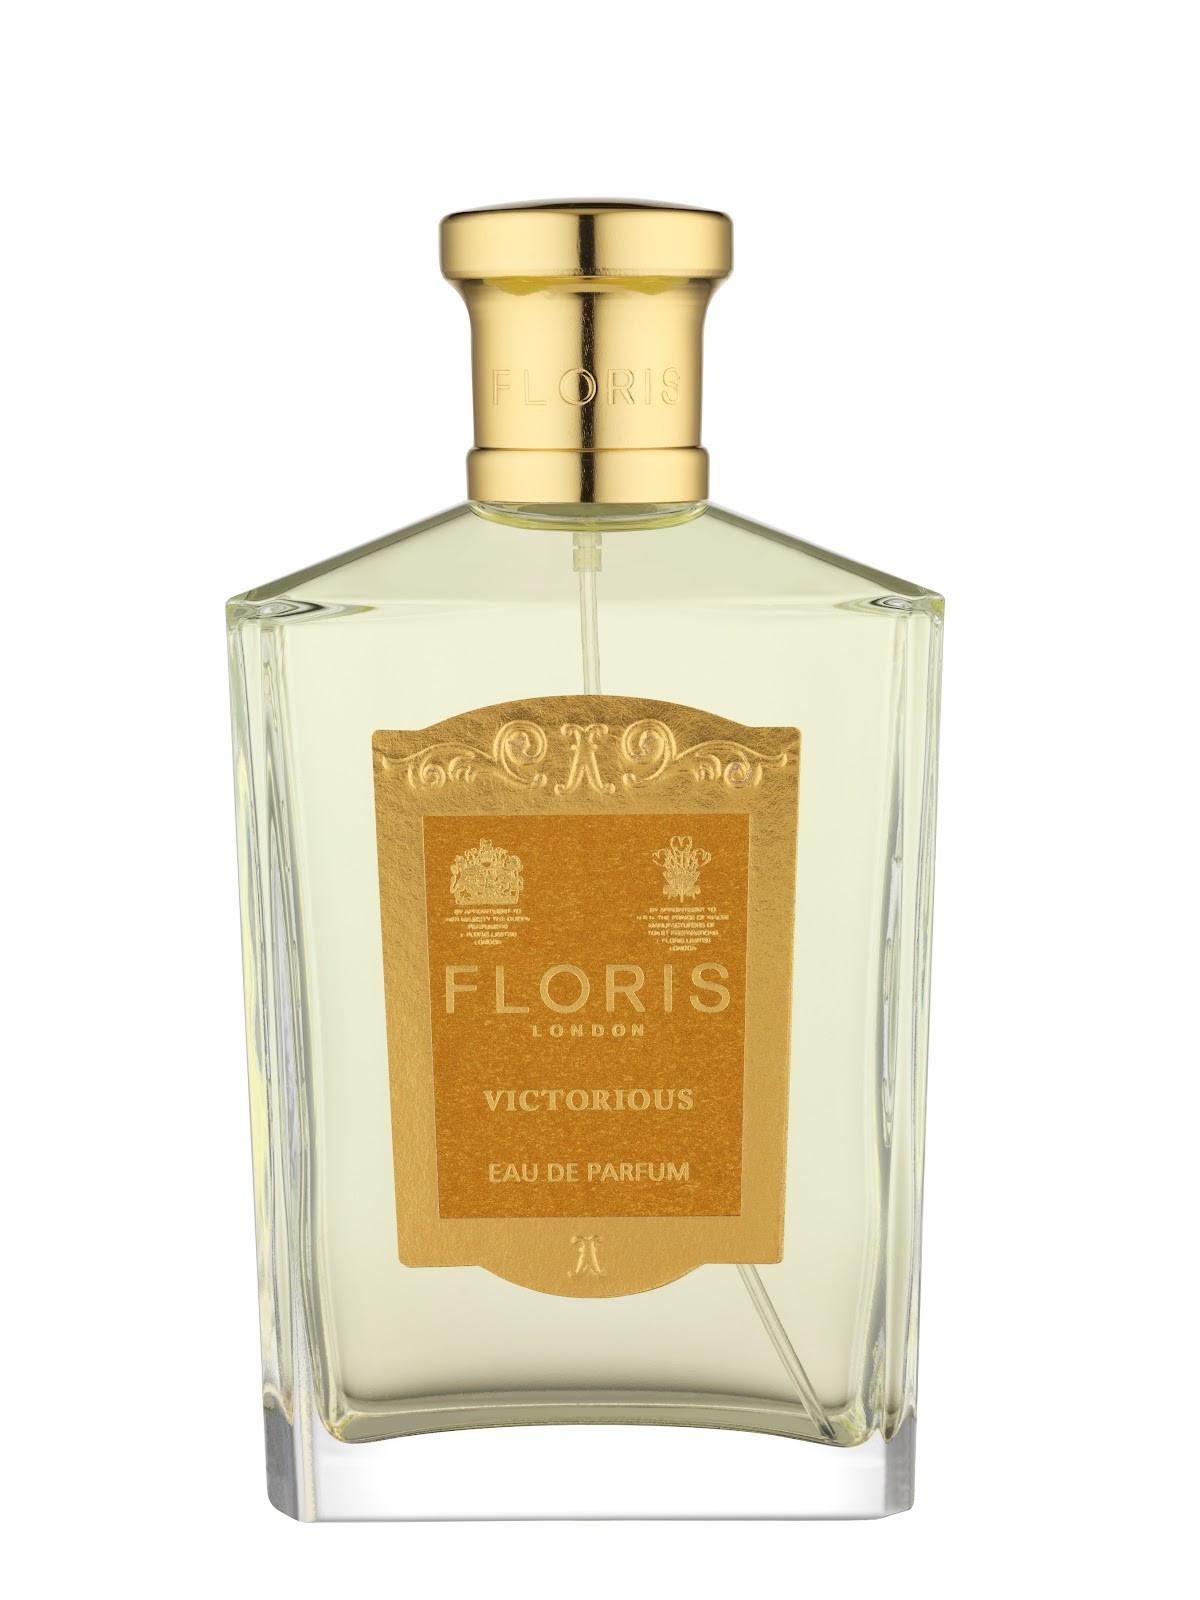 Floris Victorious аромат для мужчин и женщин